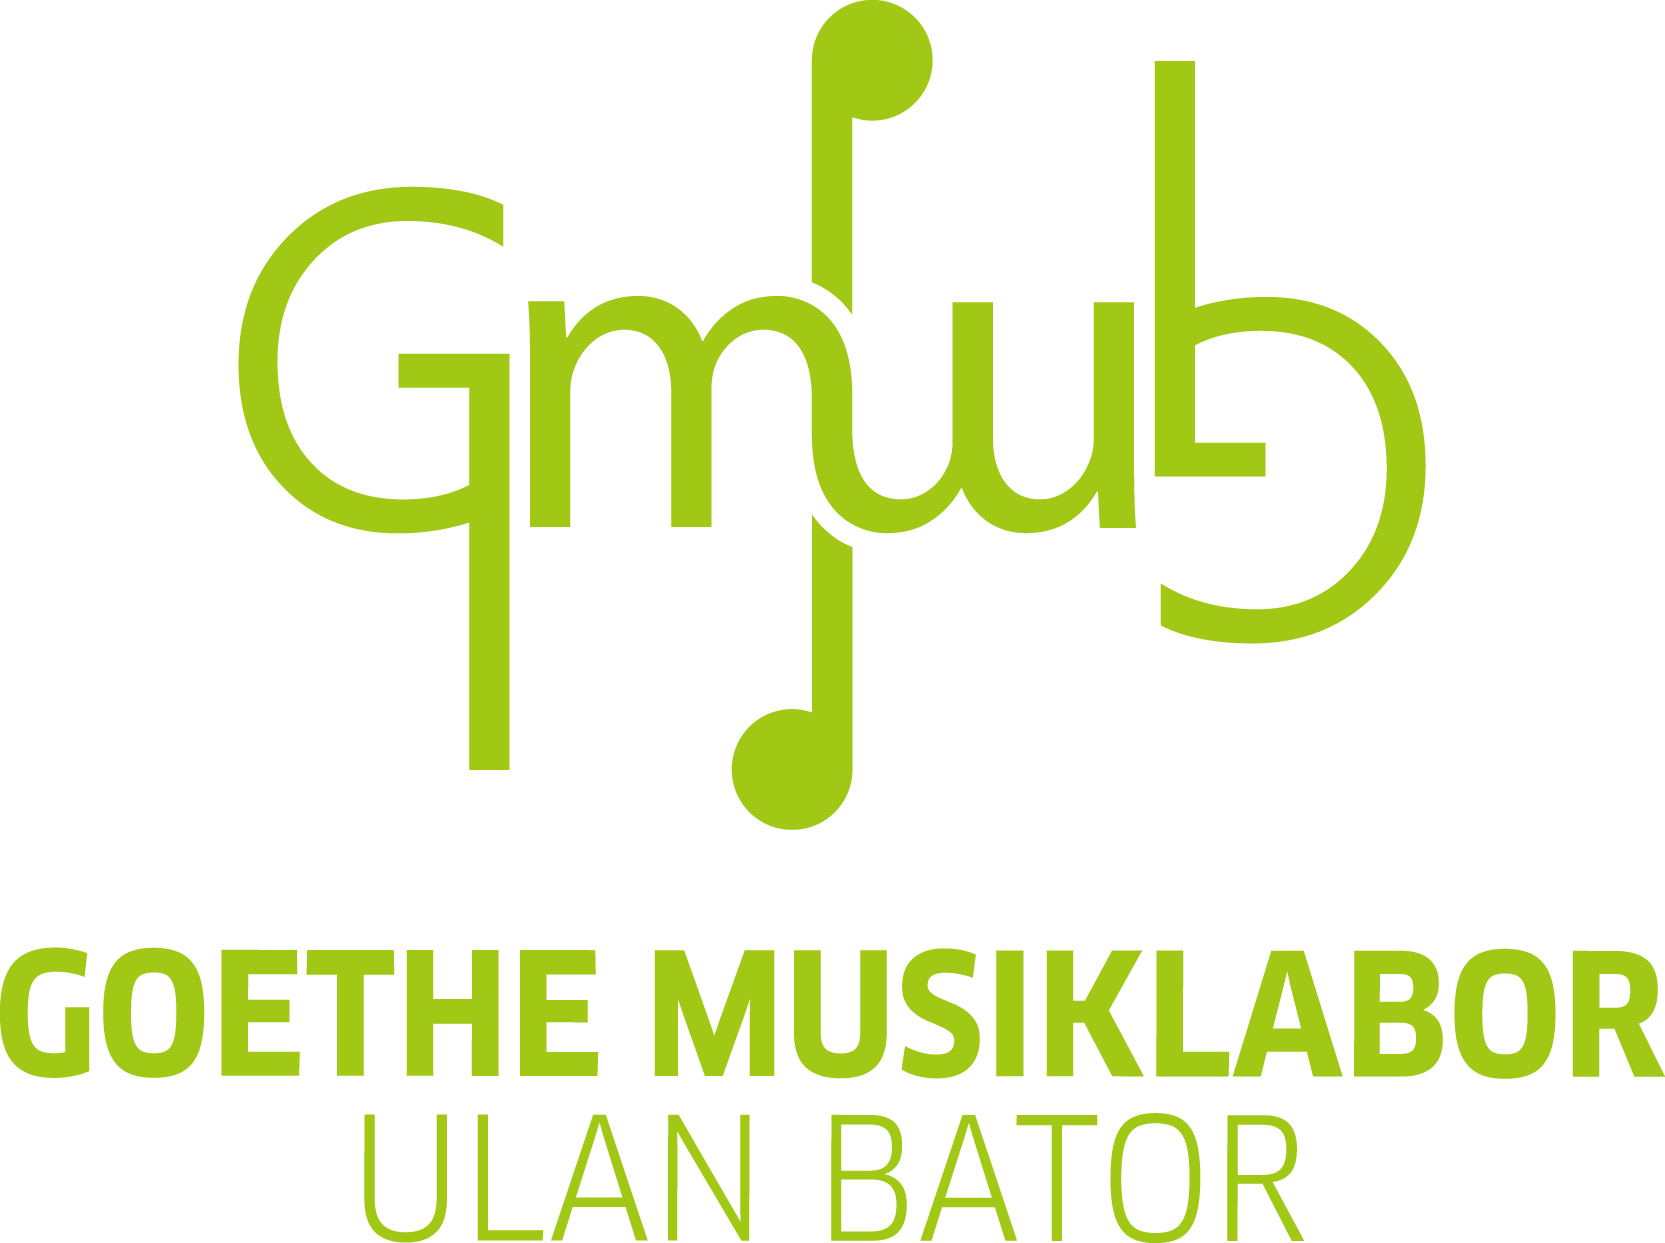 GMUB-logo-Goethe-gruen sRGB